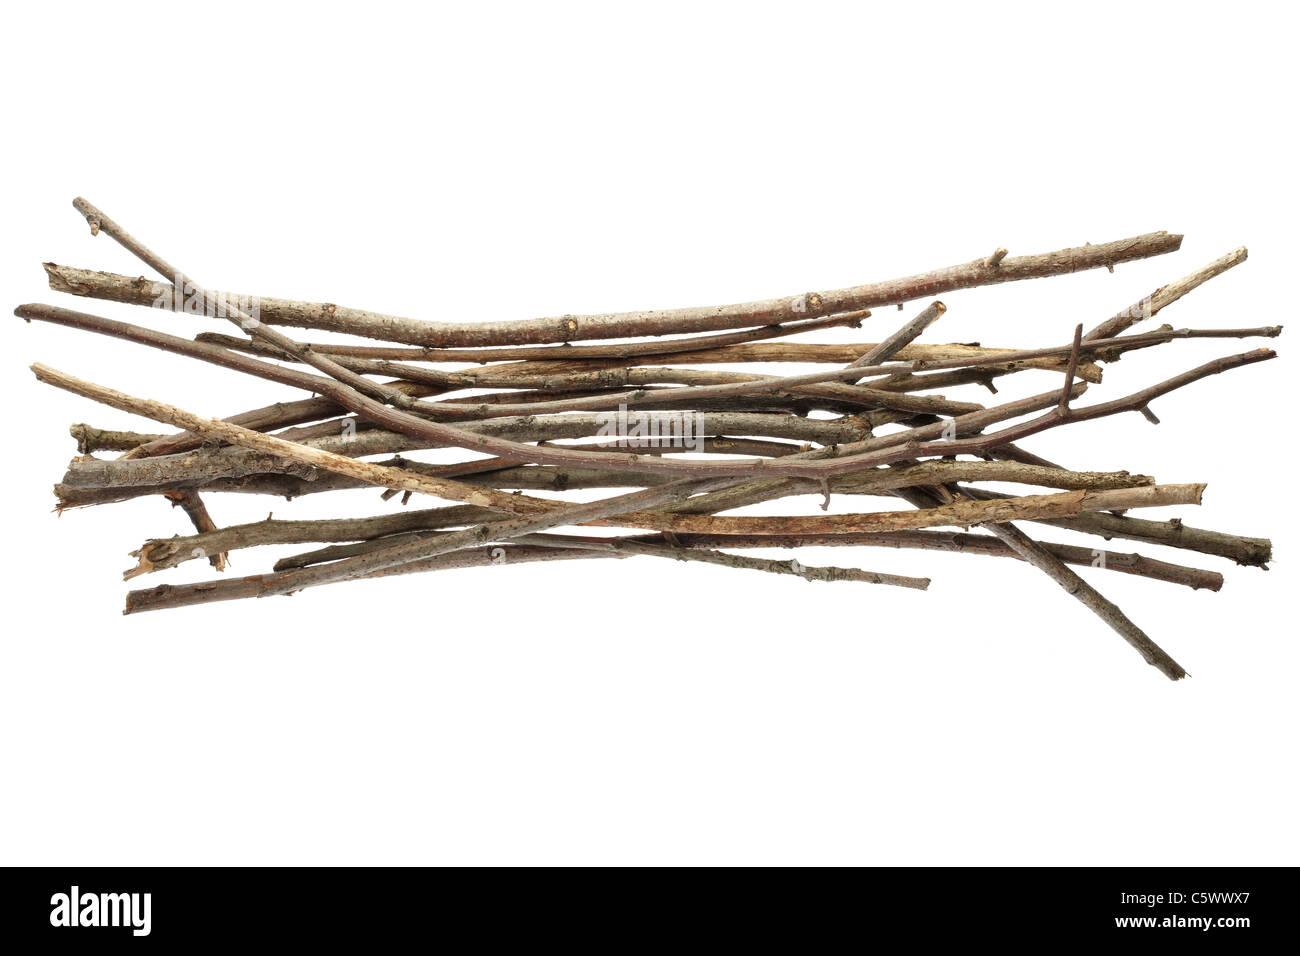 Sticks and twigs, wood bundle - Stock Image